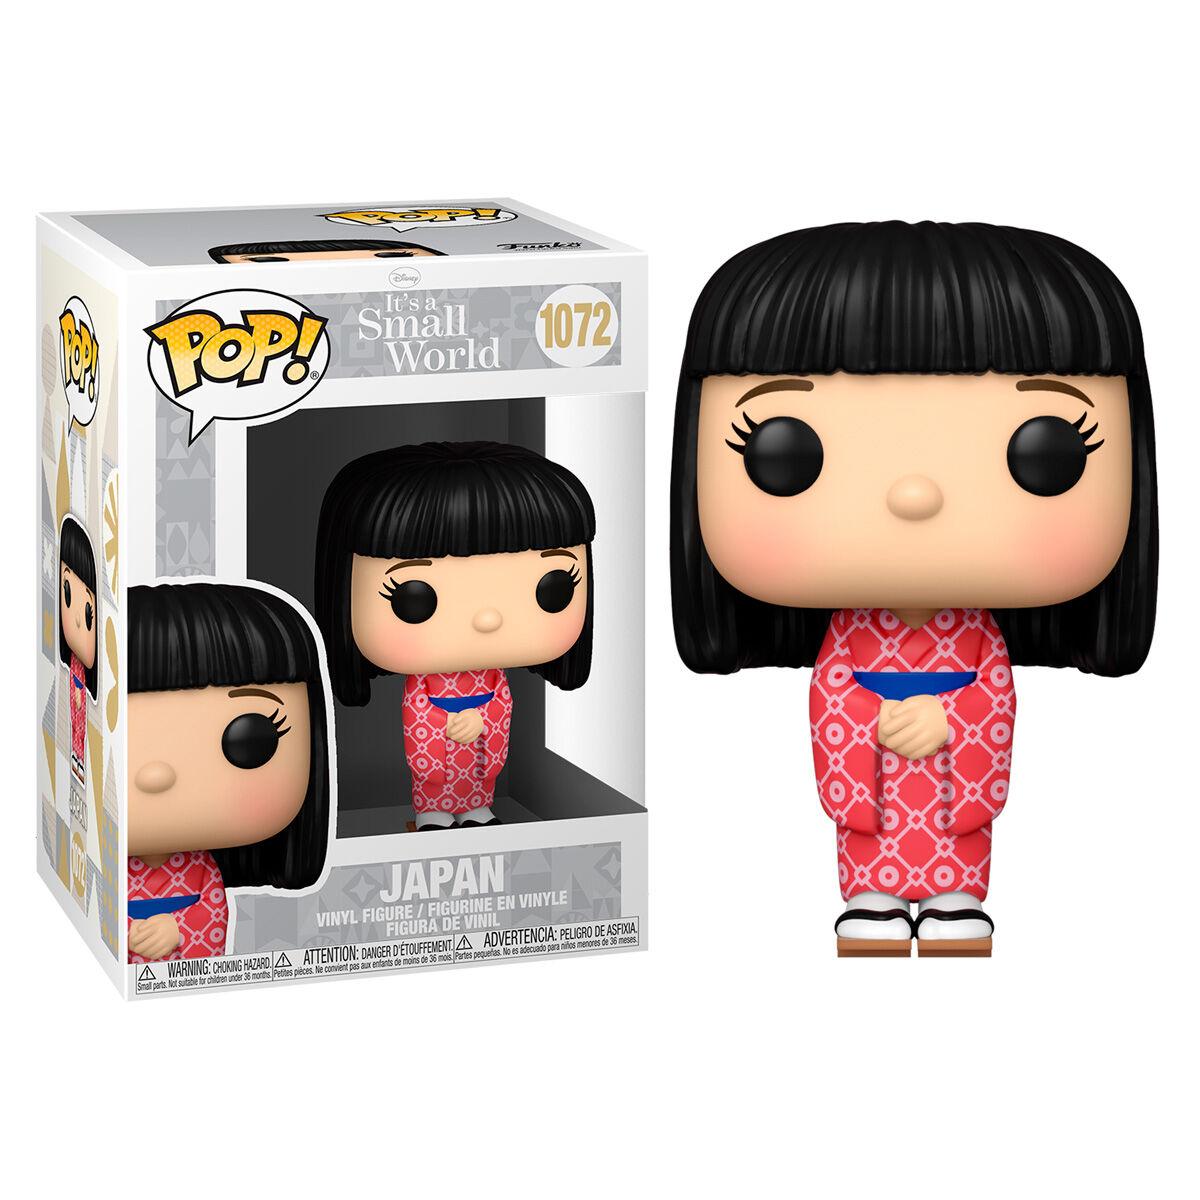 Figura POP Disney Small World Japan 889698552585